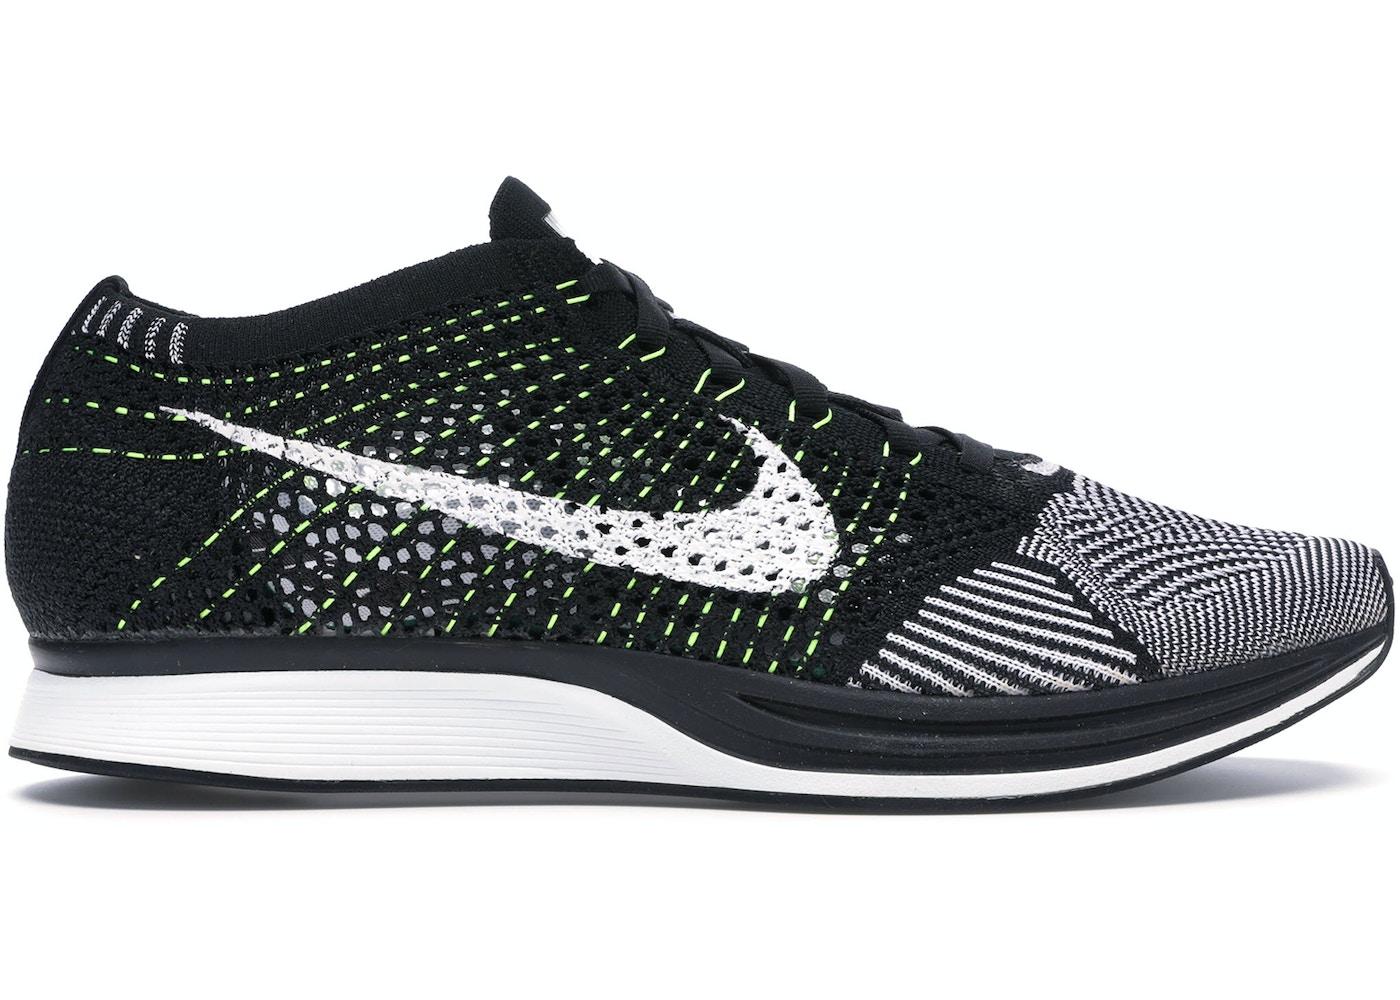 oficjalny dostawca szybka dostawa sklep internetowy Nike Flyknit Racer Black White Volt